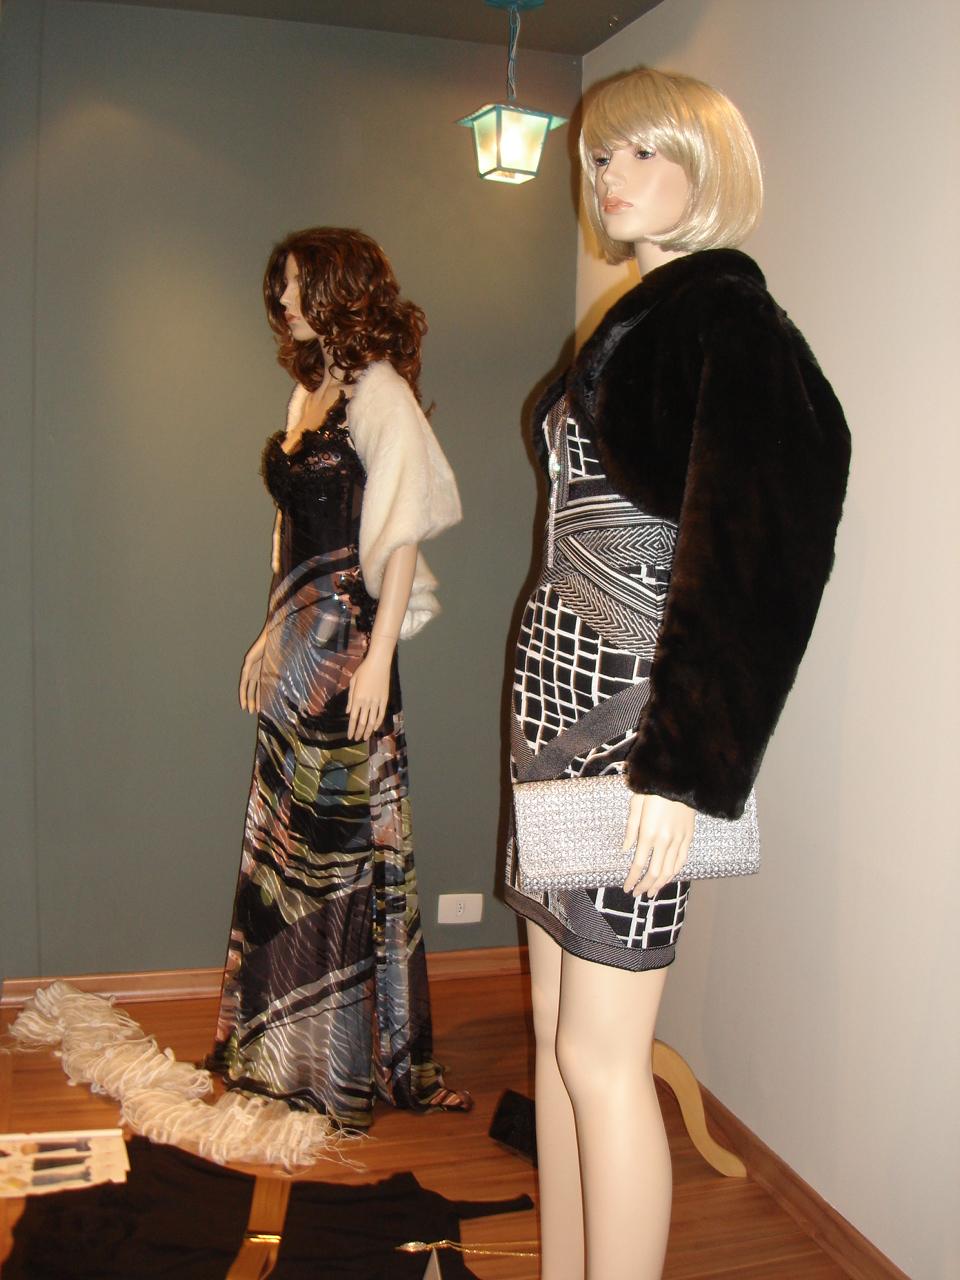 junior correia estilista santa setta boutique atelier. Black Bedroom Furniture Sets. Home Design Ideas